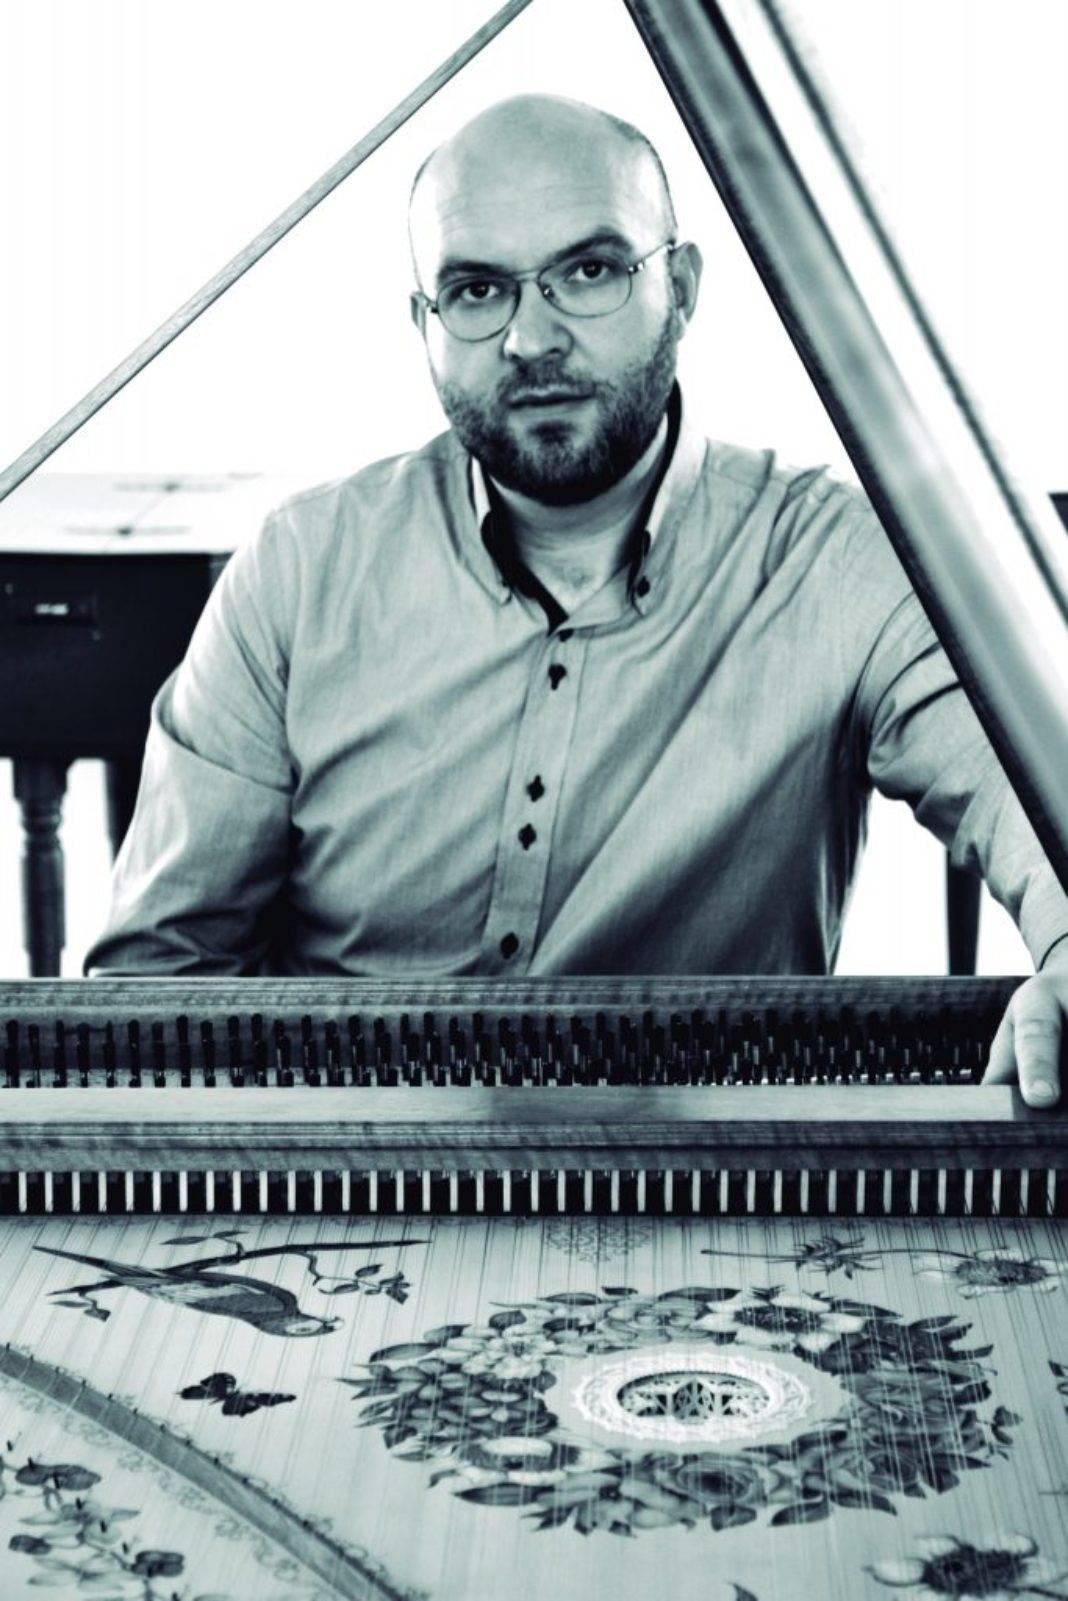 Eusebio Fernandez Villacañas 1068x1601 - Eusebio Fernández-Villacañas tocará el órgano barroco de Herencia